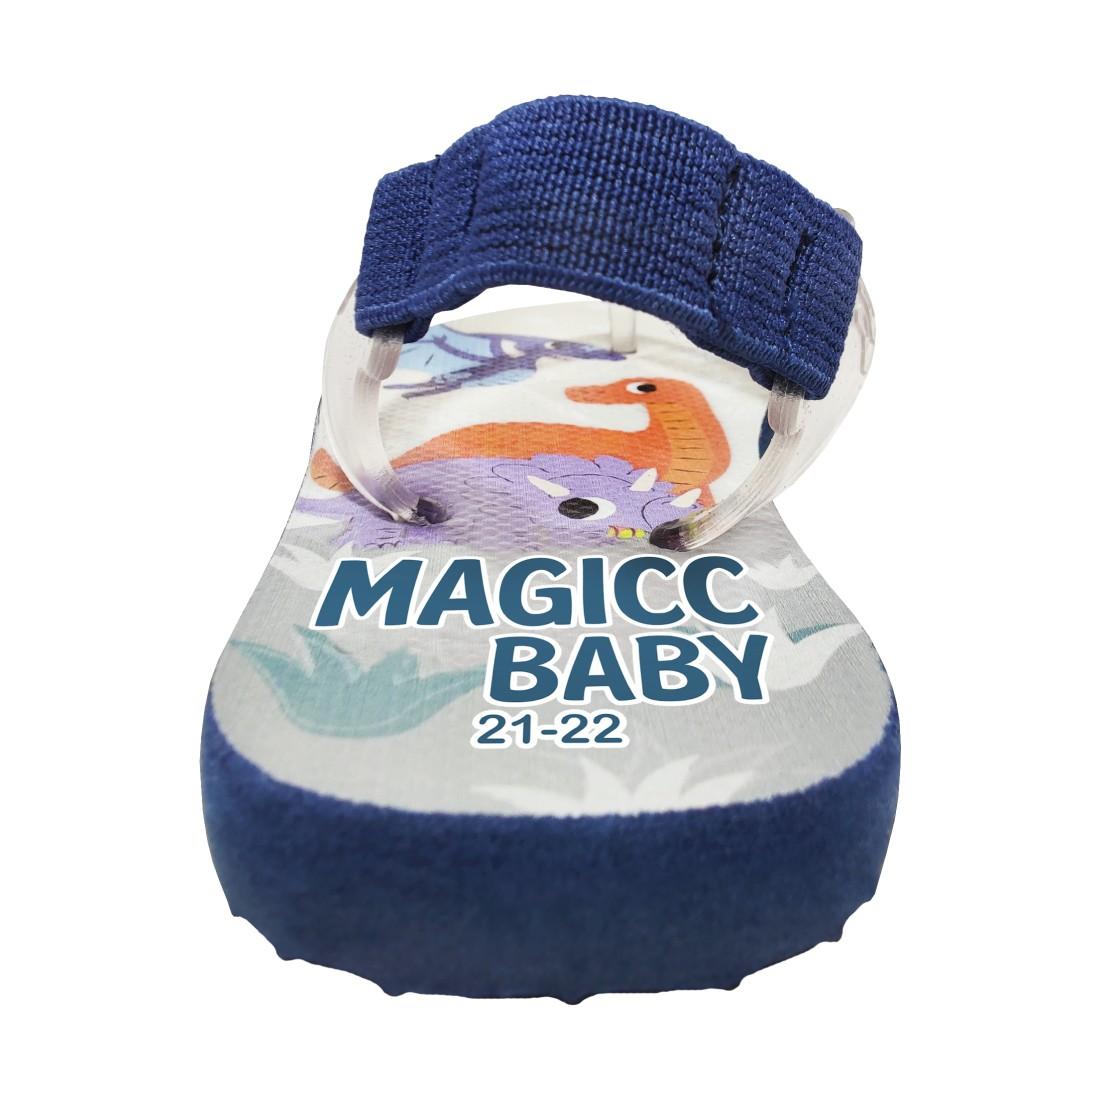 Chinelo Bebê Sandália Infantil Dinos Meninos Magicc Baby